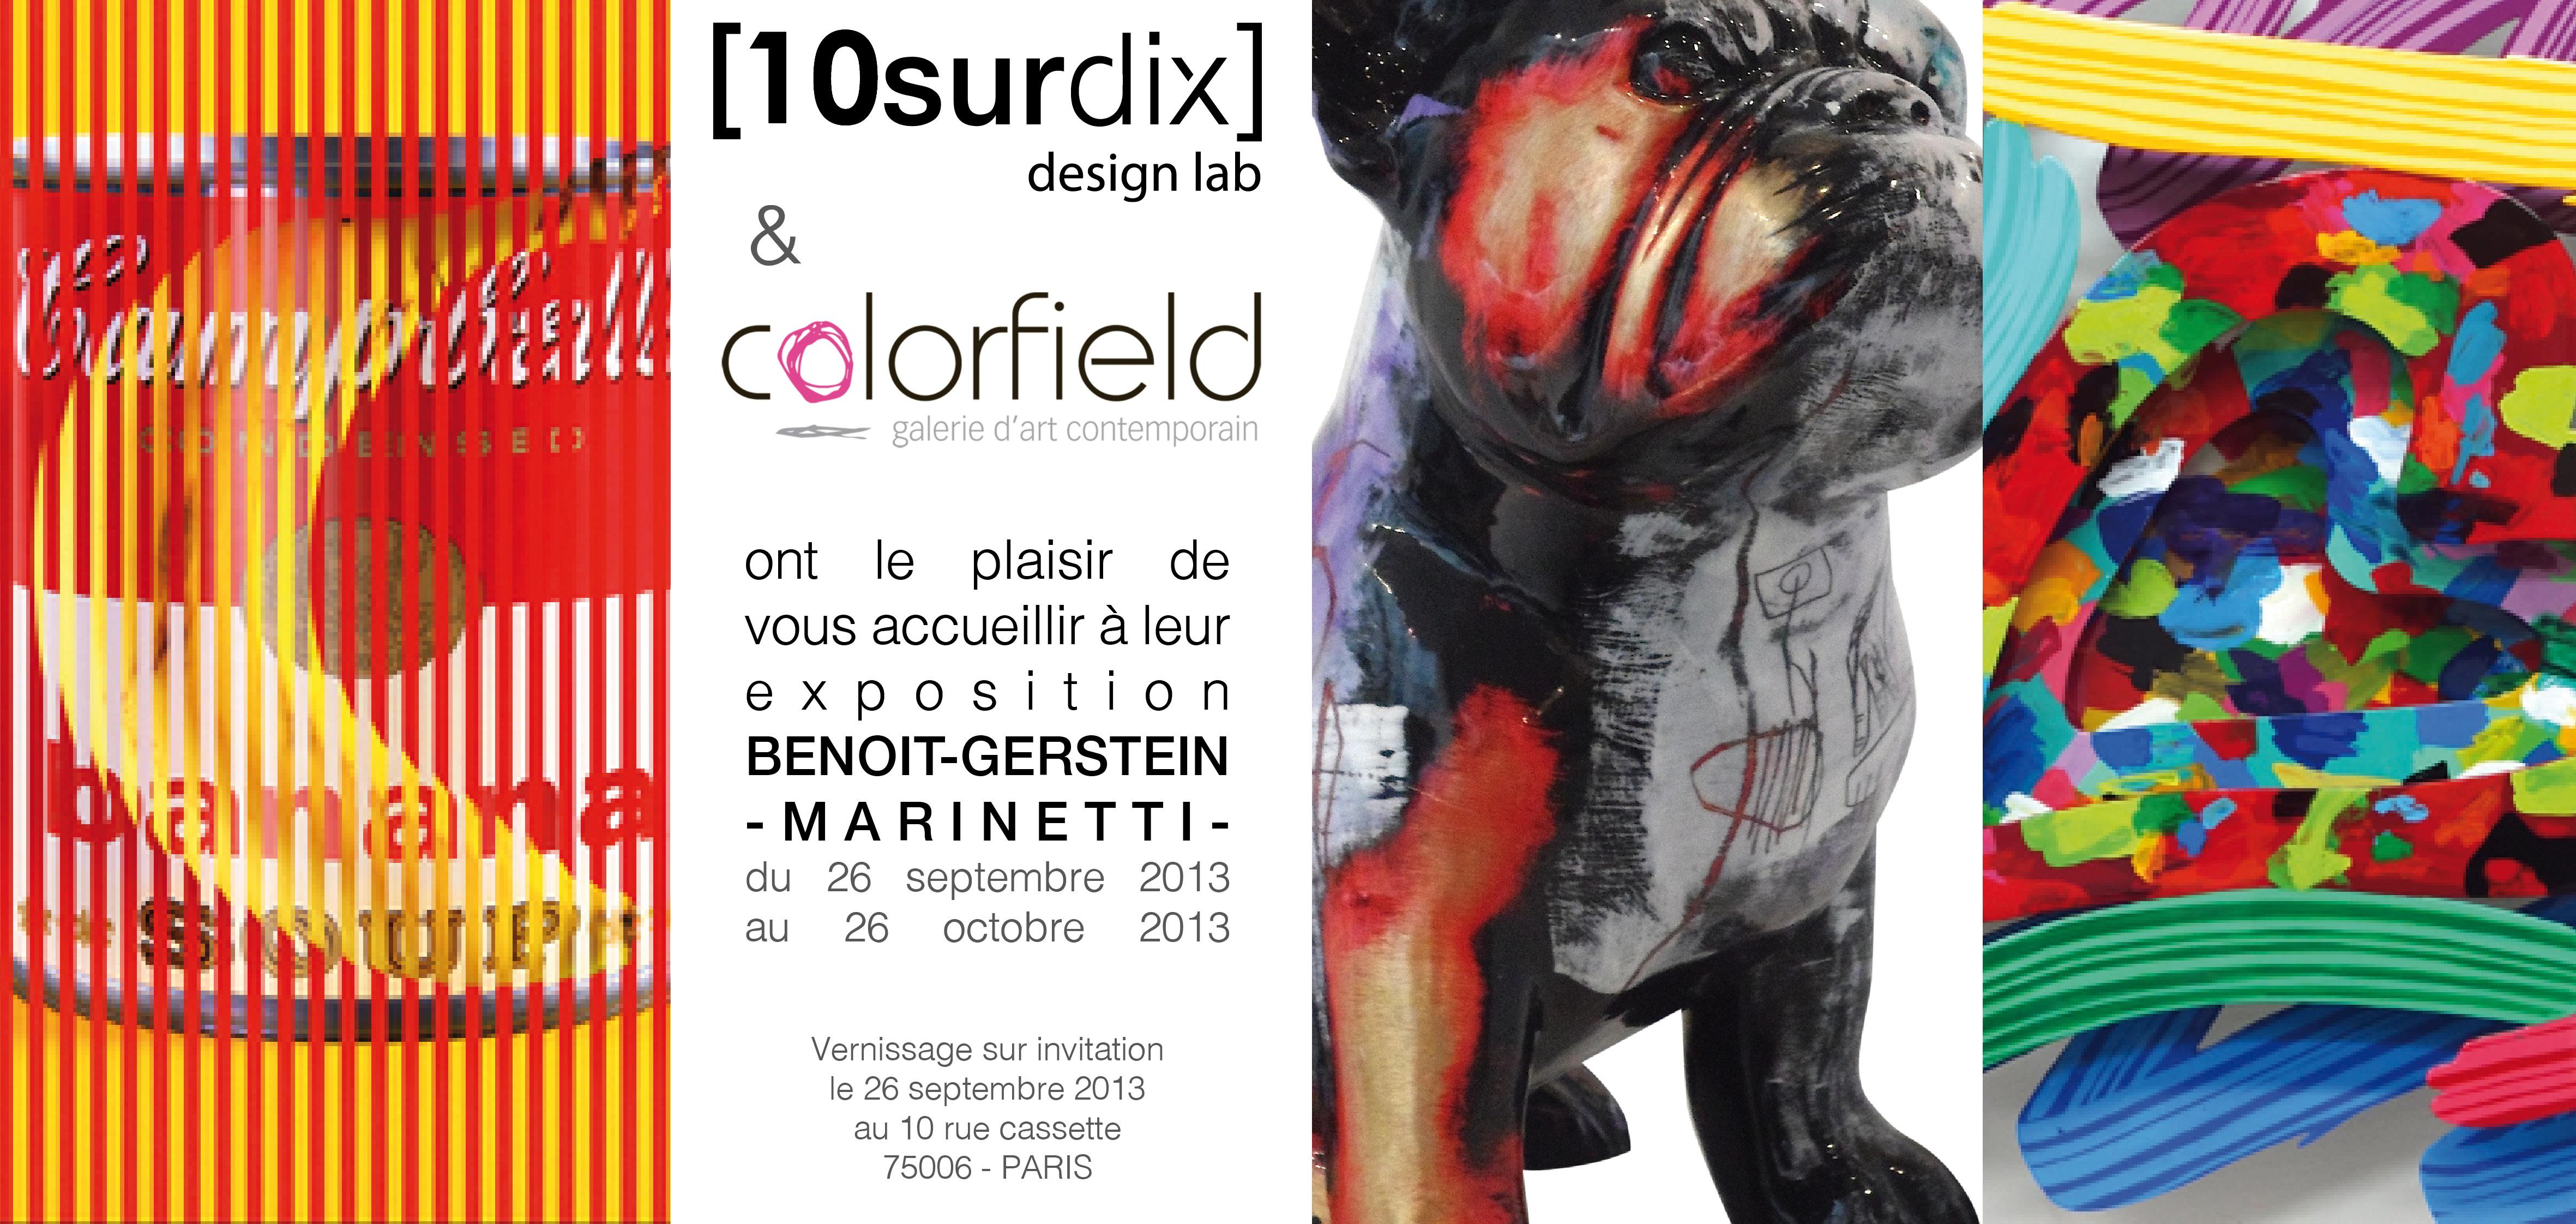 10surdix exposition benoit gerstein marinetti chez 10surdix 10surdix. Black Bedroom Furniture Sets. Home Design Ideas